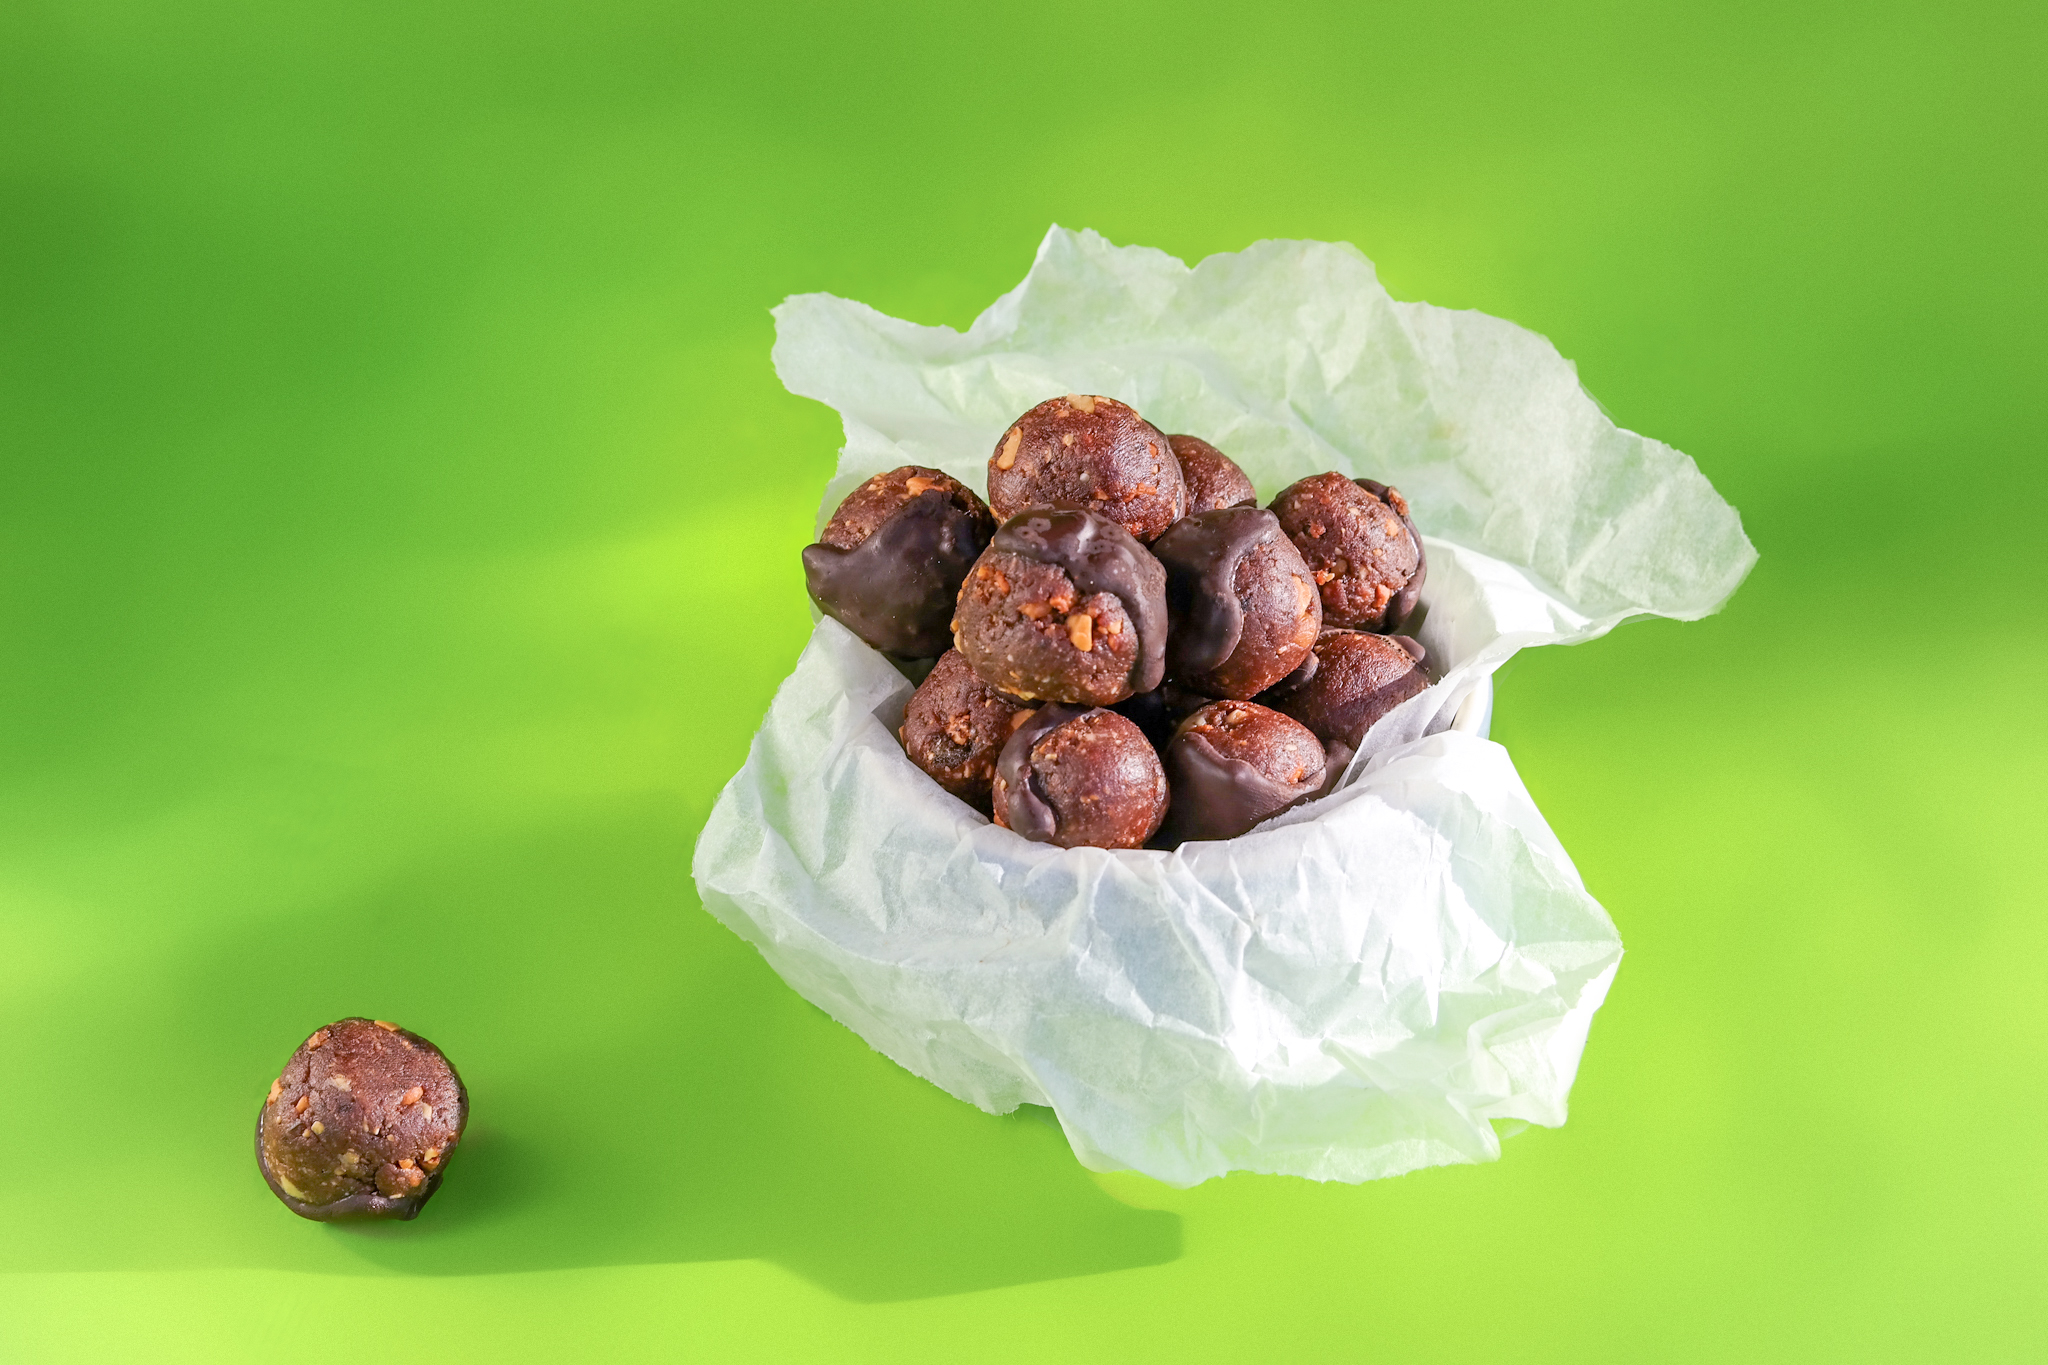 homemade energy balls recipe